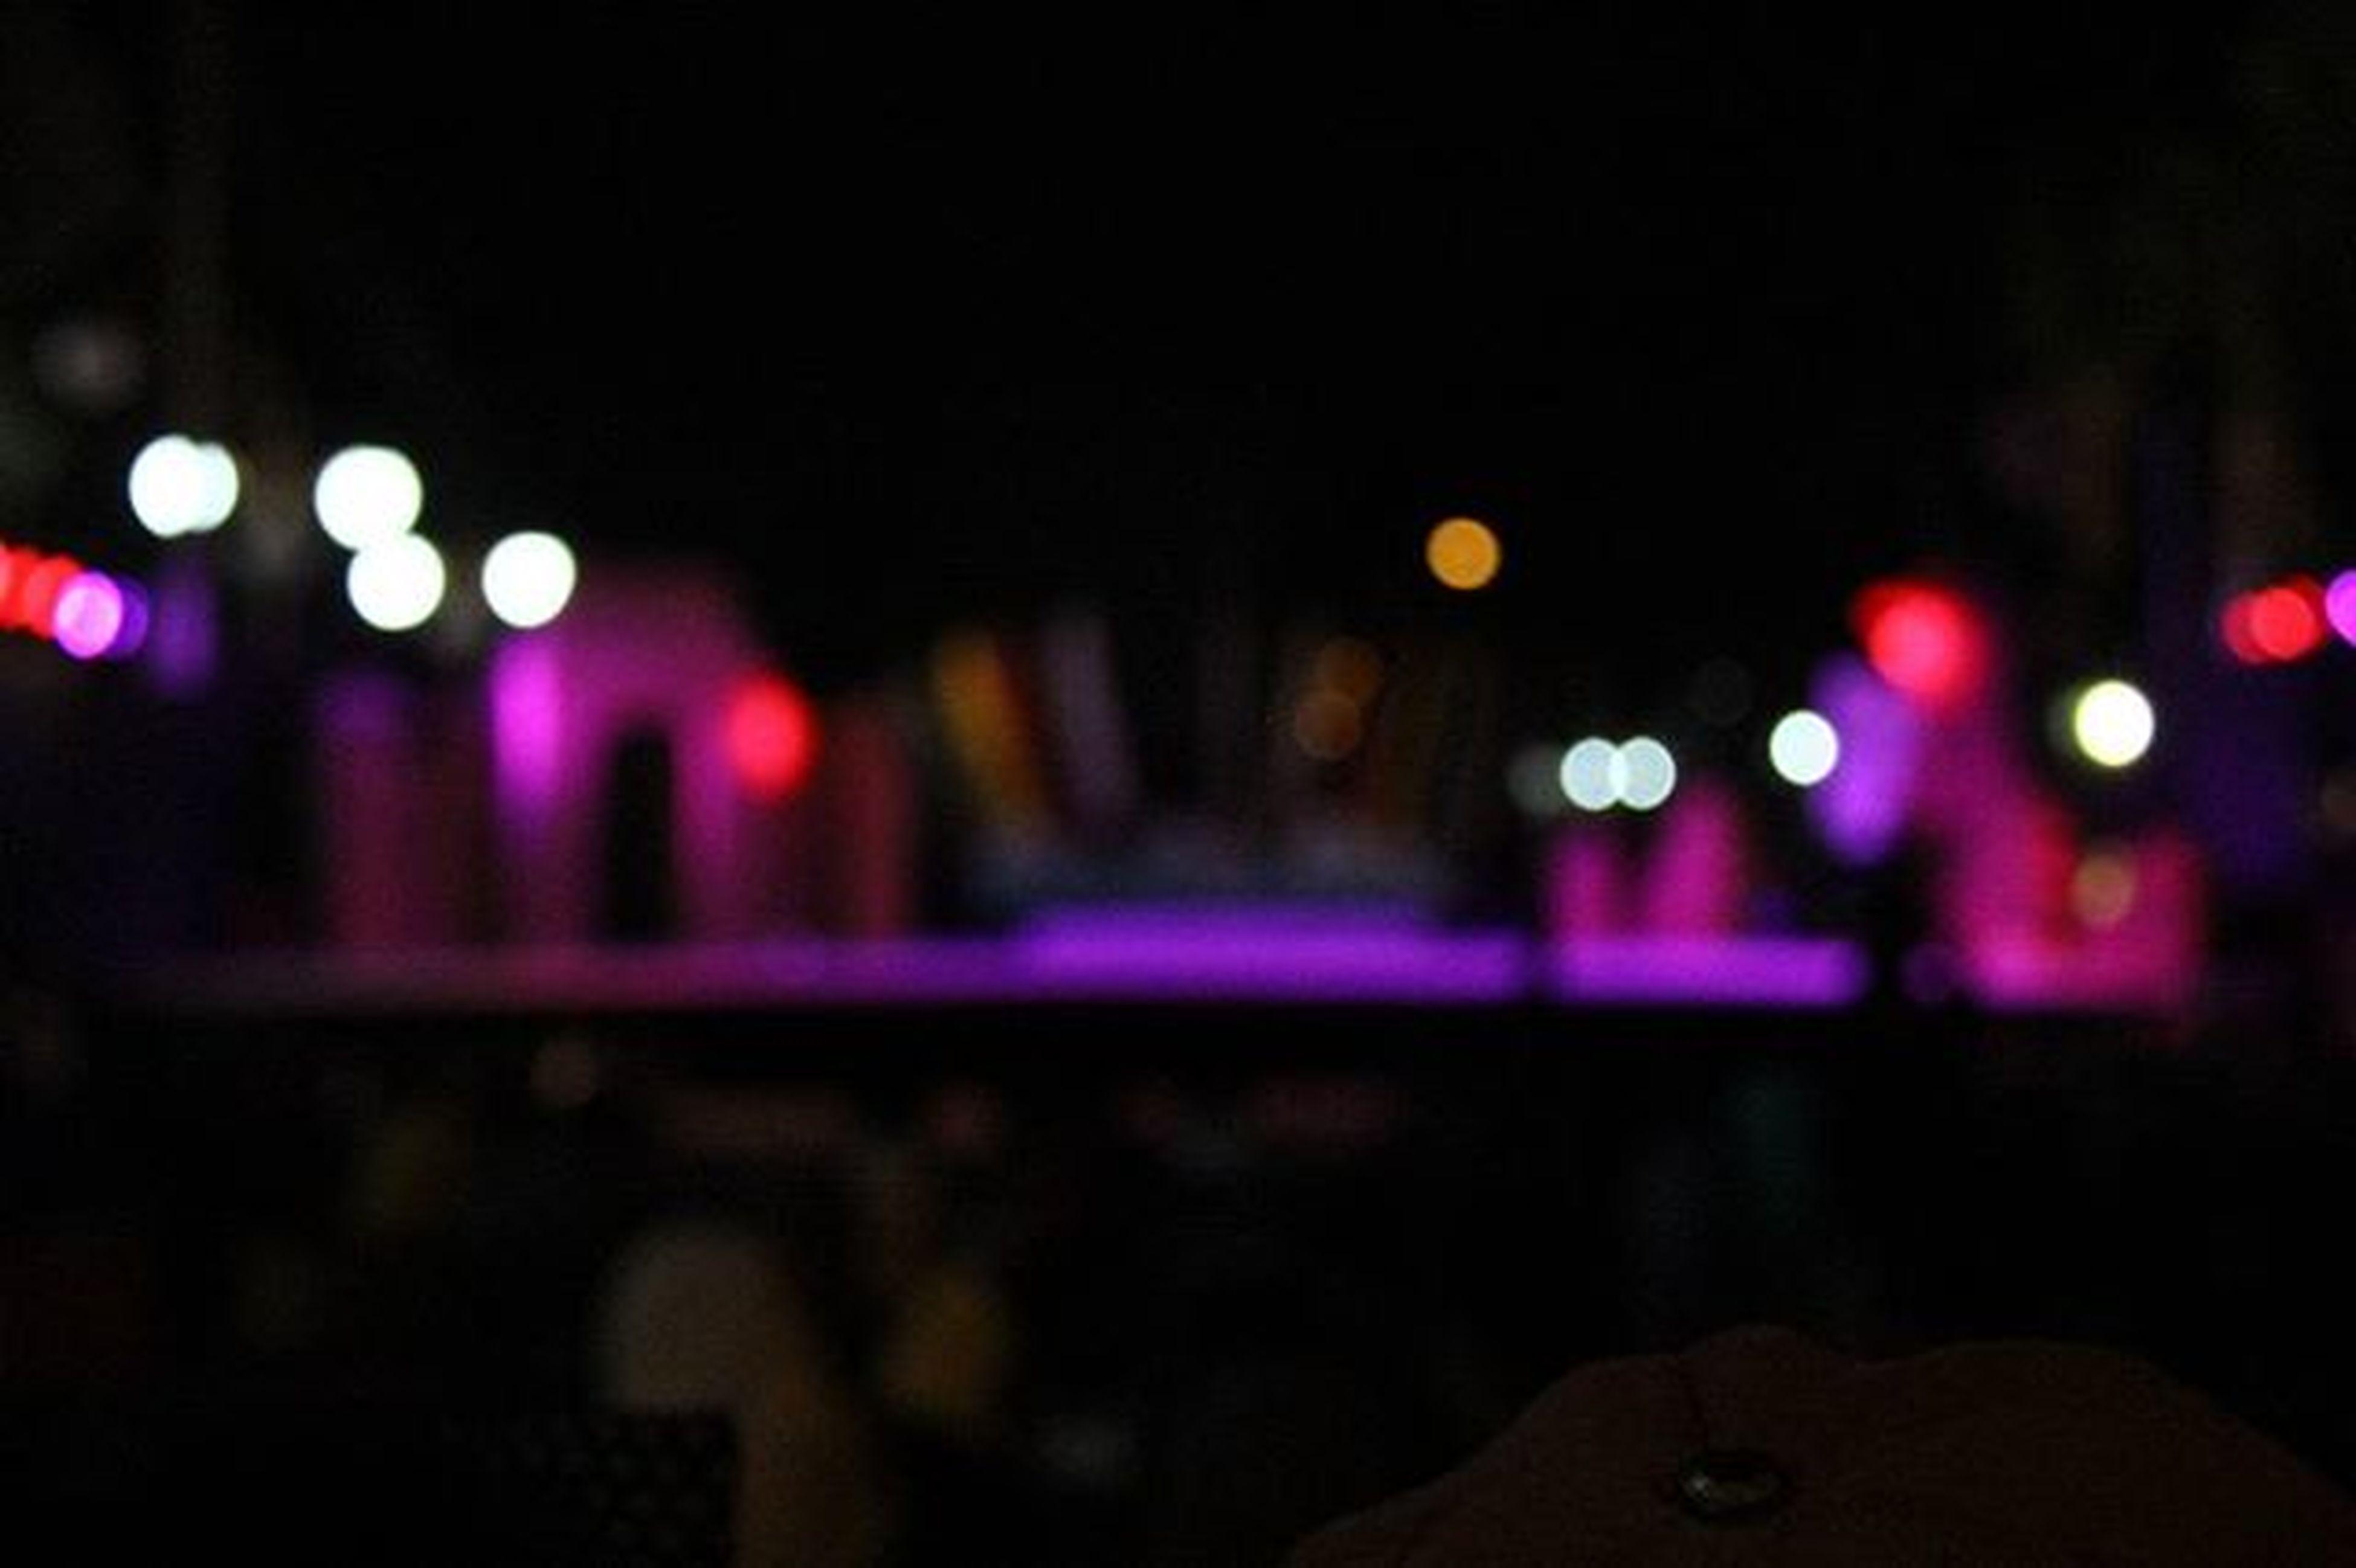 illuminated, night, defocused, lighting equipment, multi colored, light - natural phenomenon, glowing, street light, city, light, no people, dark, electric light, decoration, outdoors, street, copy space, long exposure, light effect, red